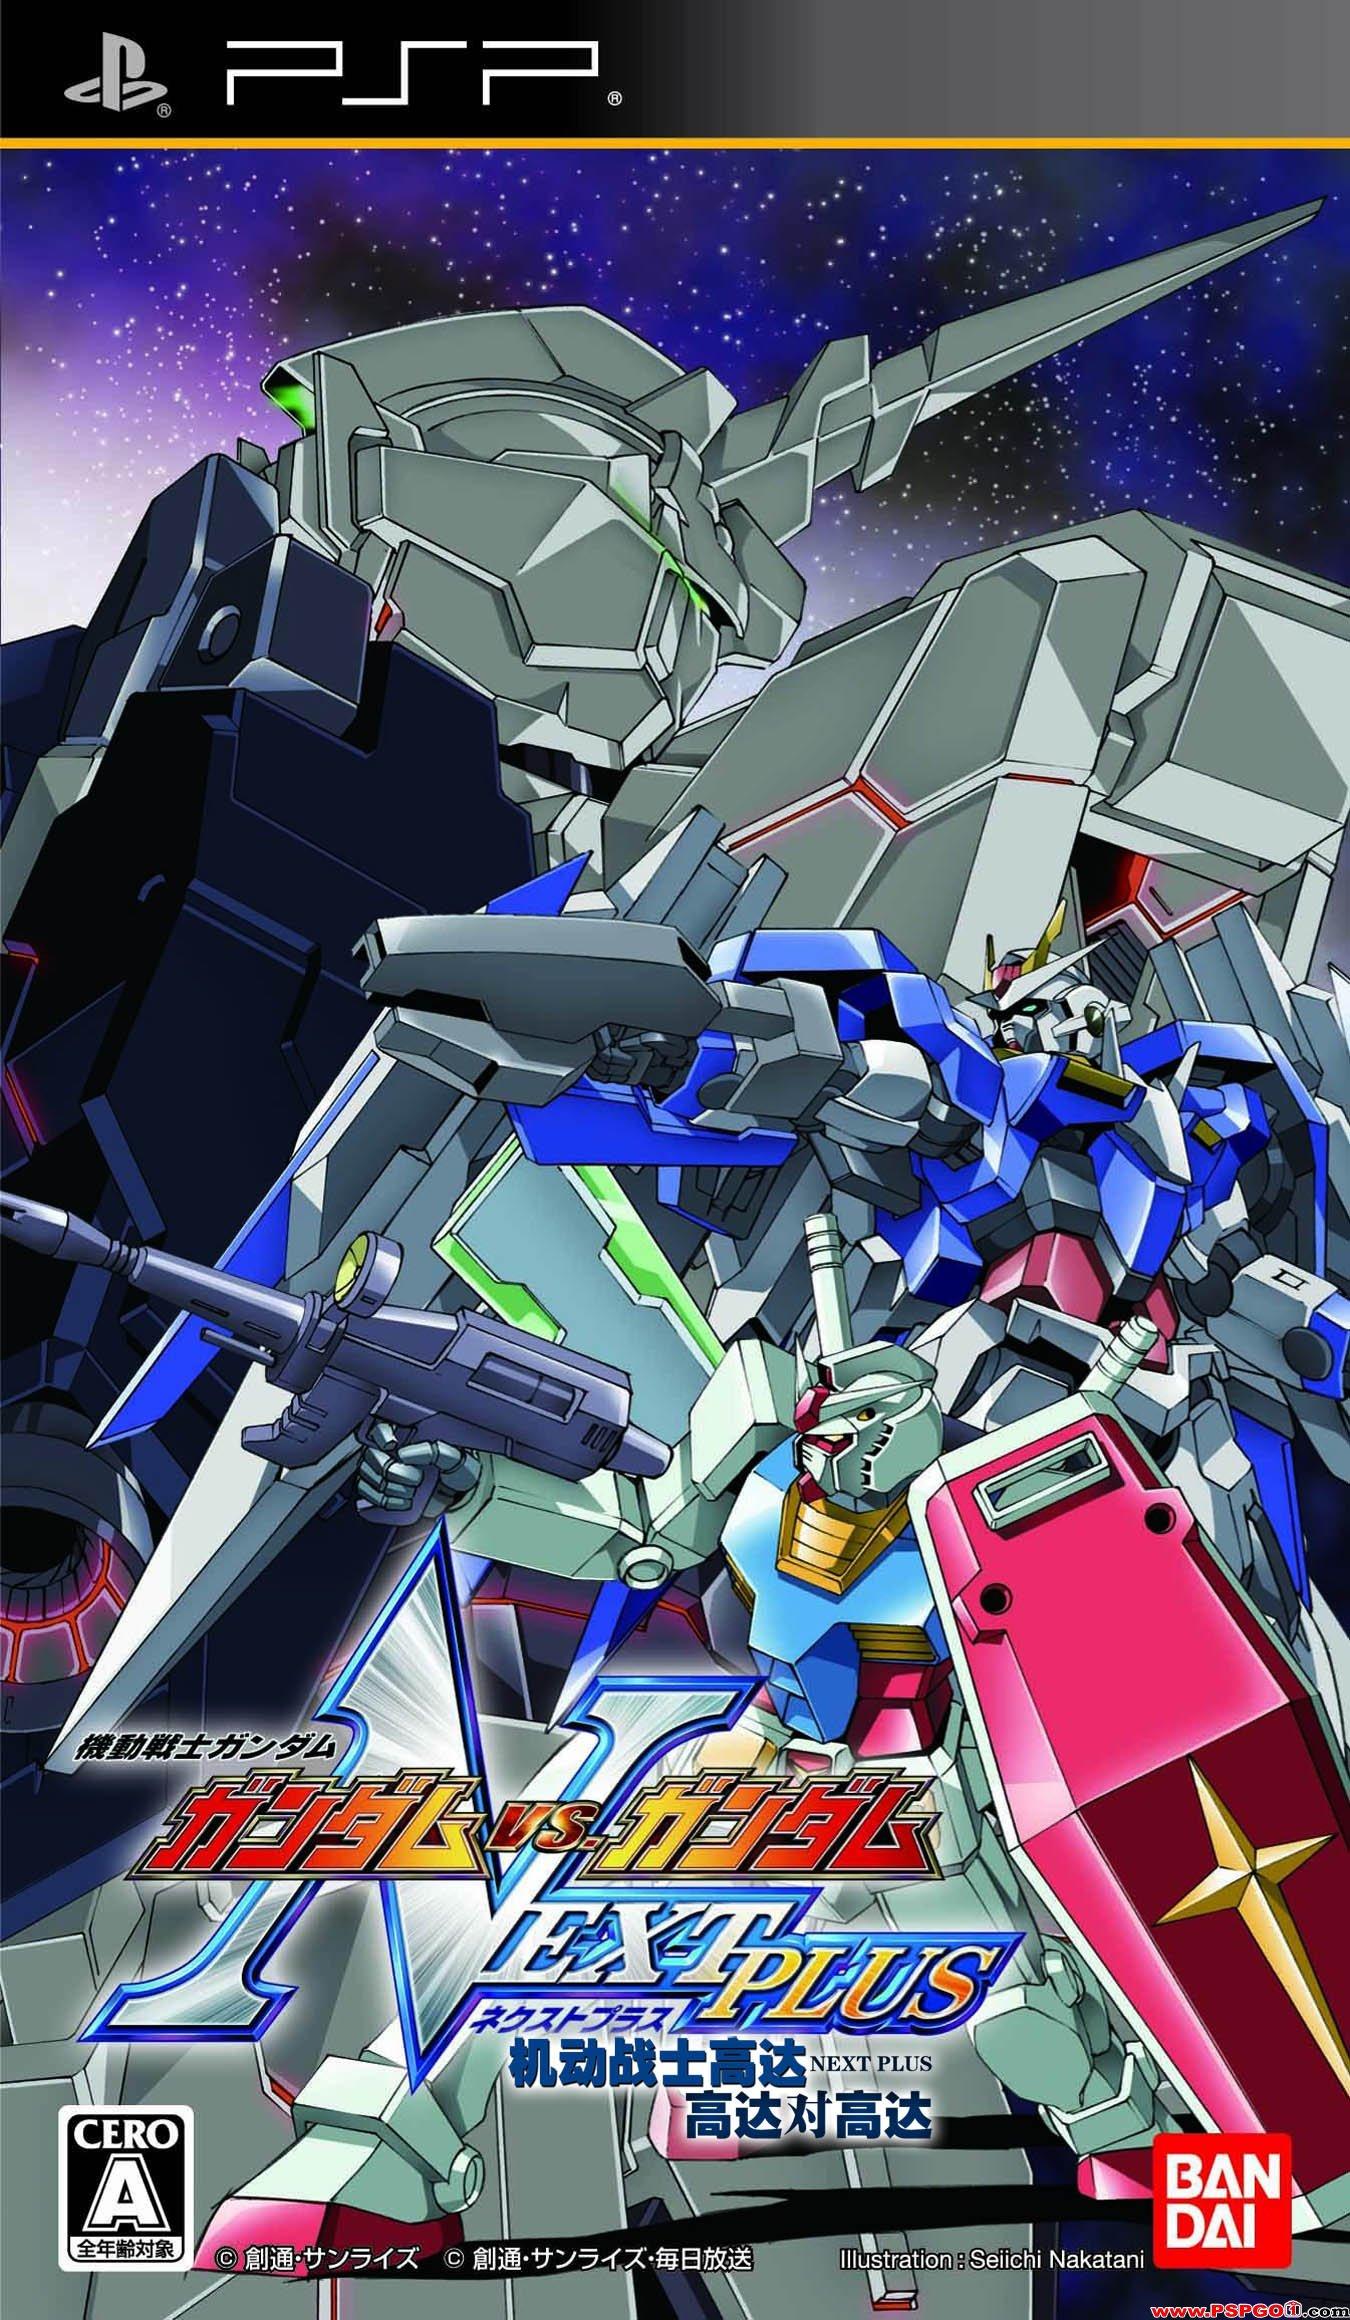 Rom juego Kidou Senshi Gundam - Gundam Vs. Gundam NEXT PLUS